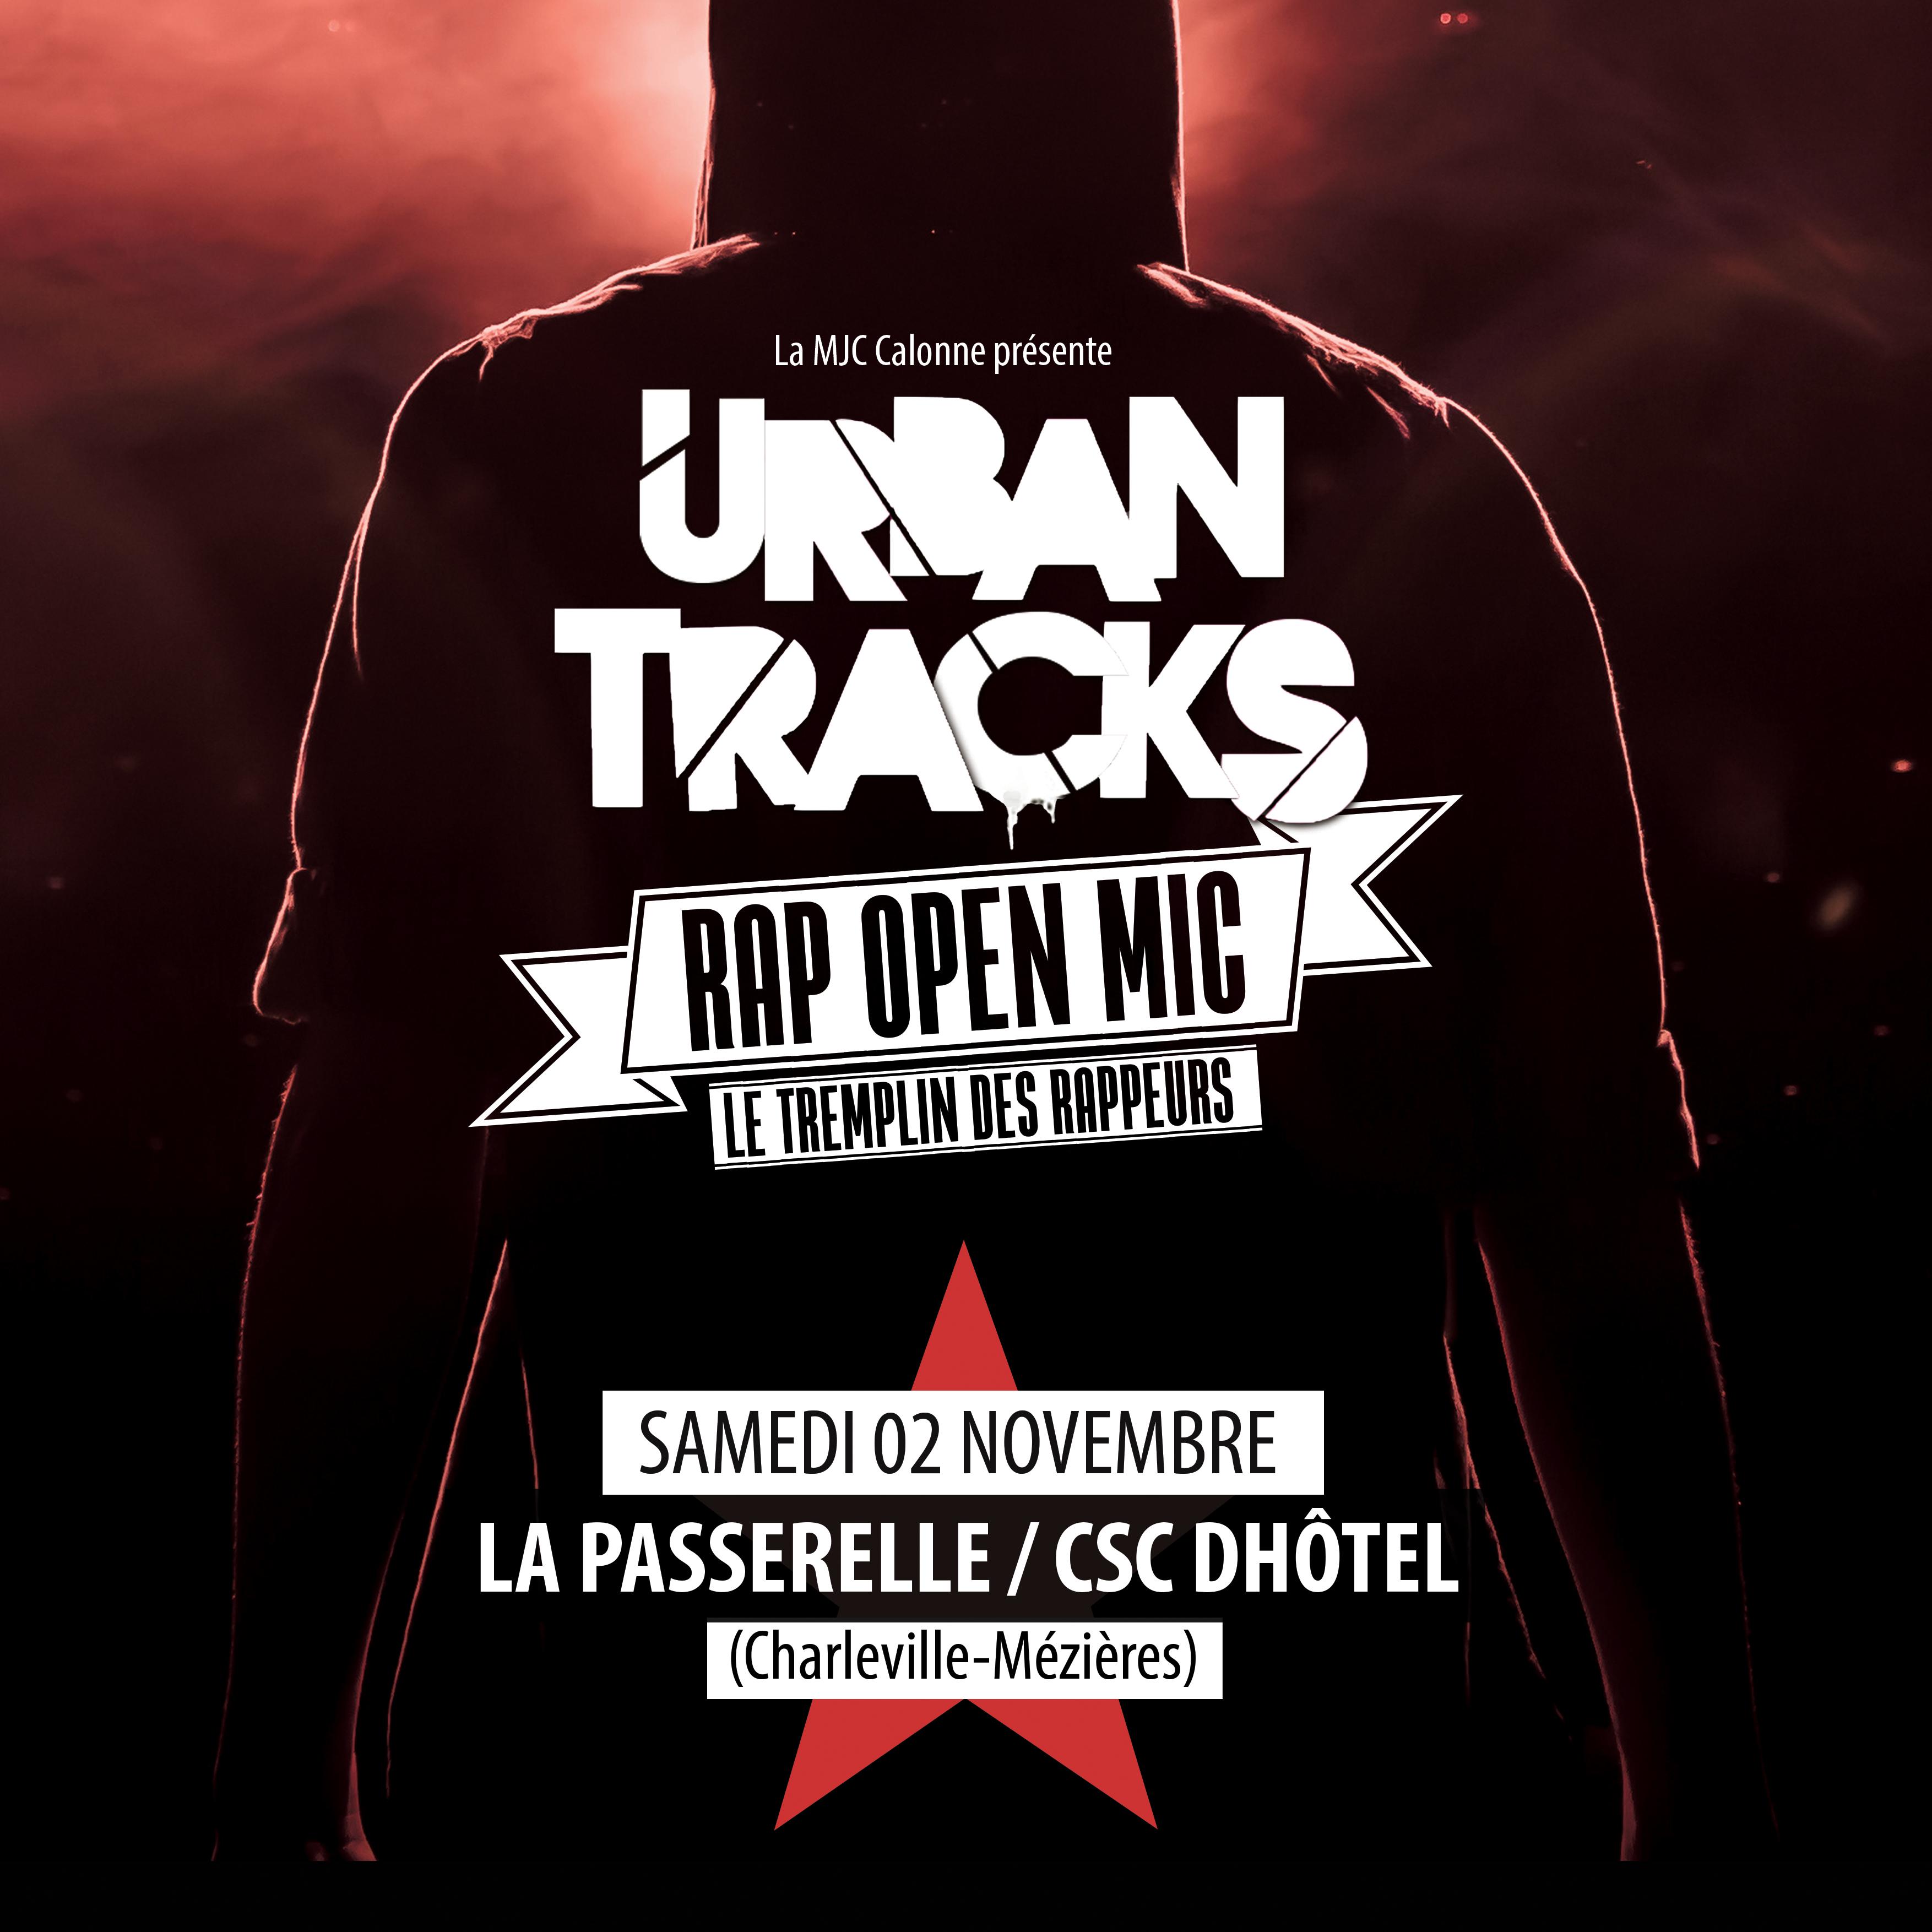 Urban Tracks – Tremplin Rap Open Mic